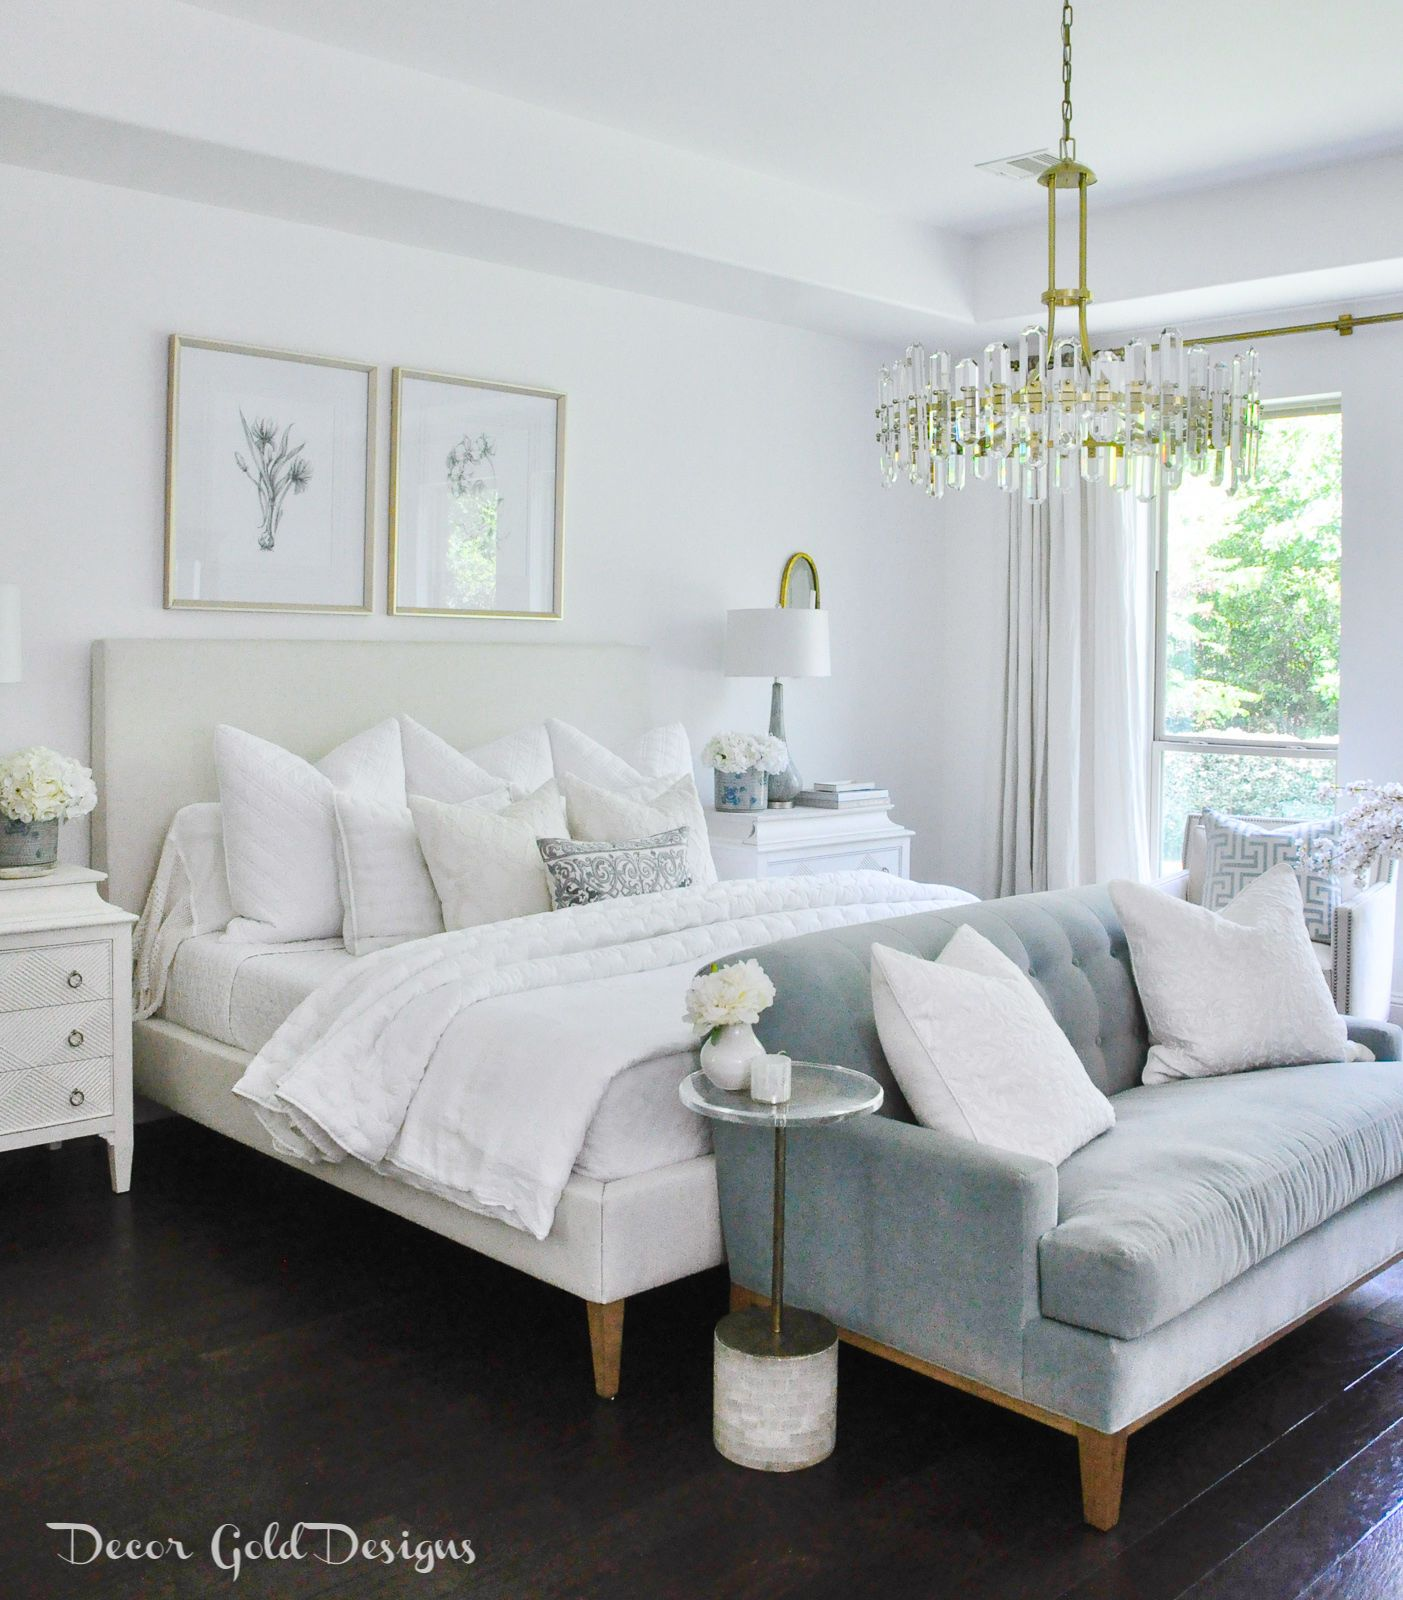 Dream Lighting A New Focal Point Decor Gold Designs Bedroom Interior Master Bedrooms Decor Home Decor